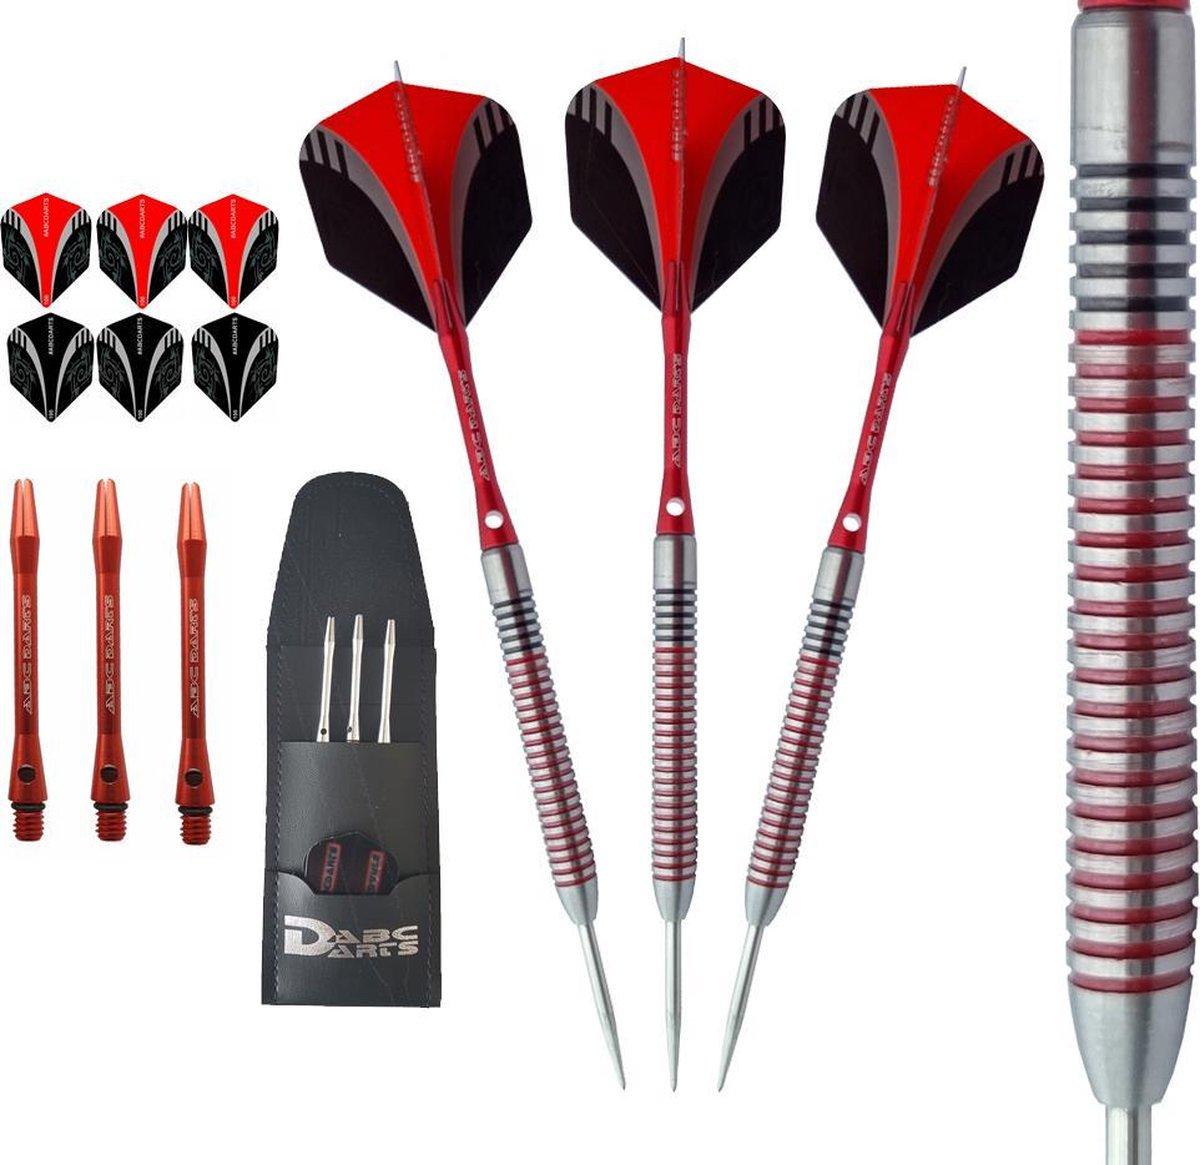 ABC Darts Professionele Dartpijlen - Red Dragonas Multi Ring - 20 gram